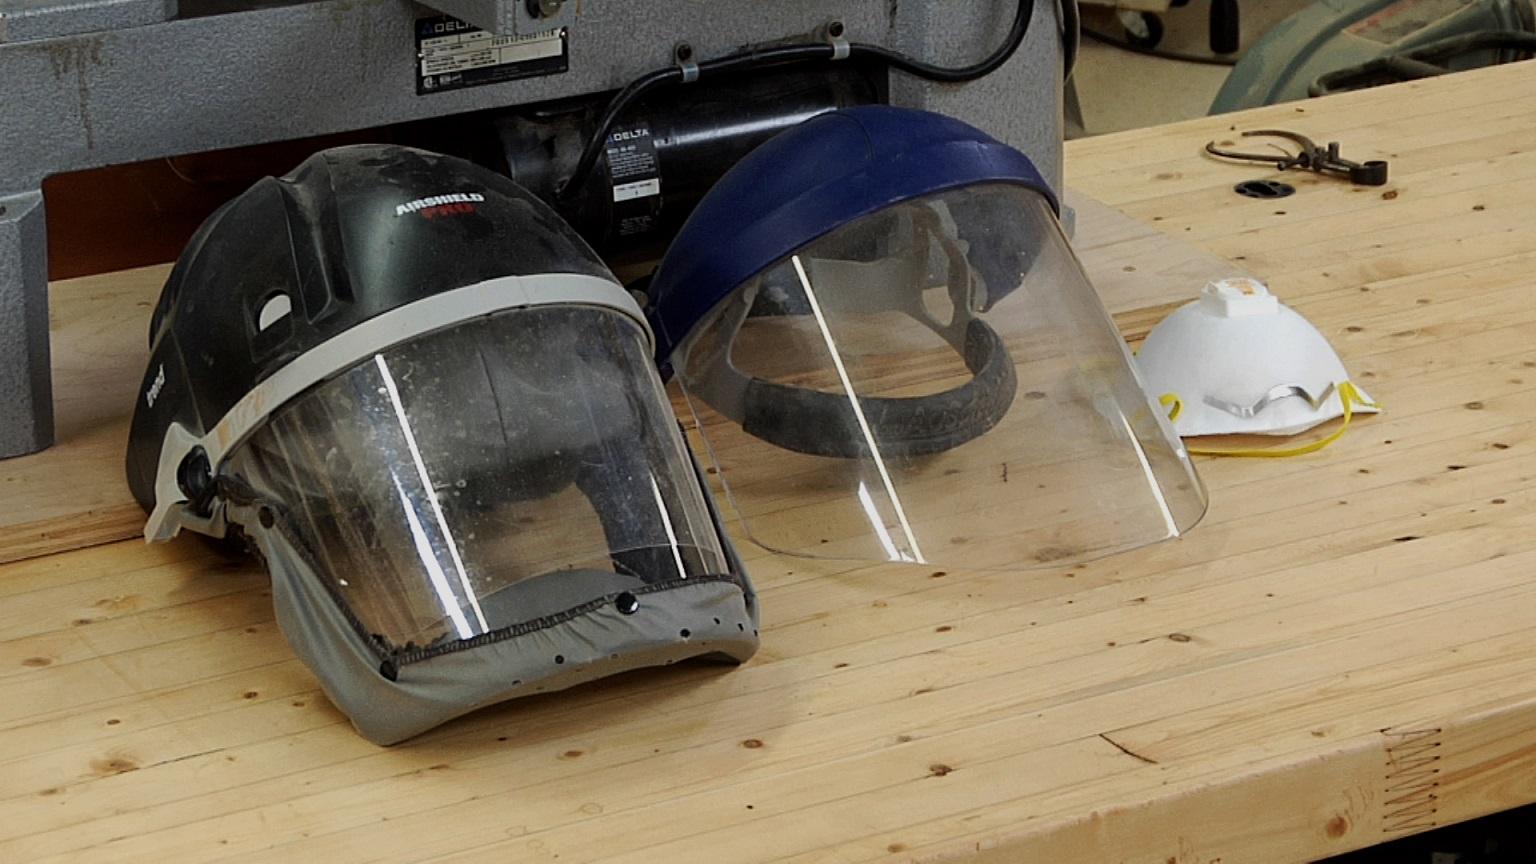 Lathe Safety Face Shield vs Respirator  WWGOA